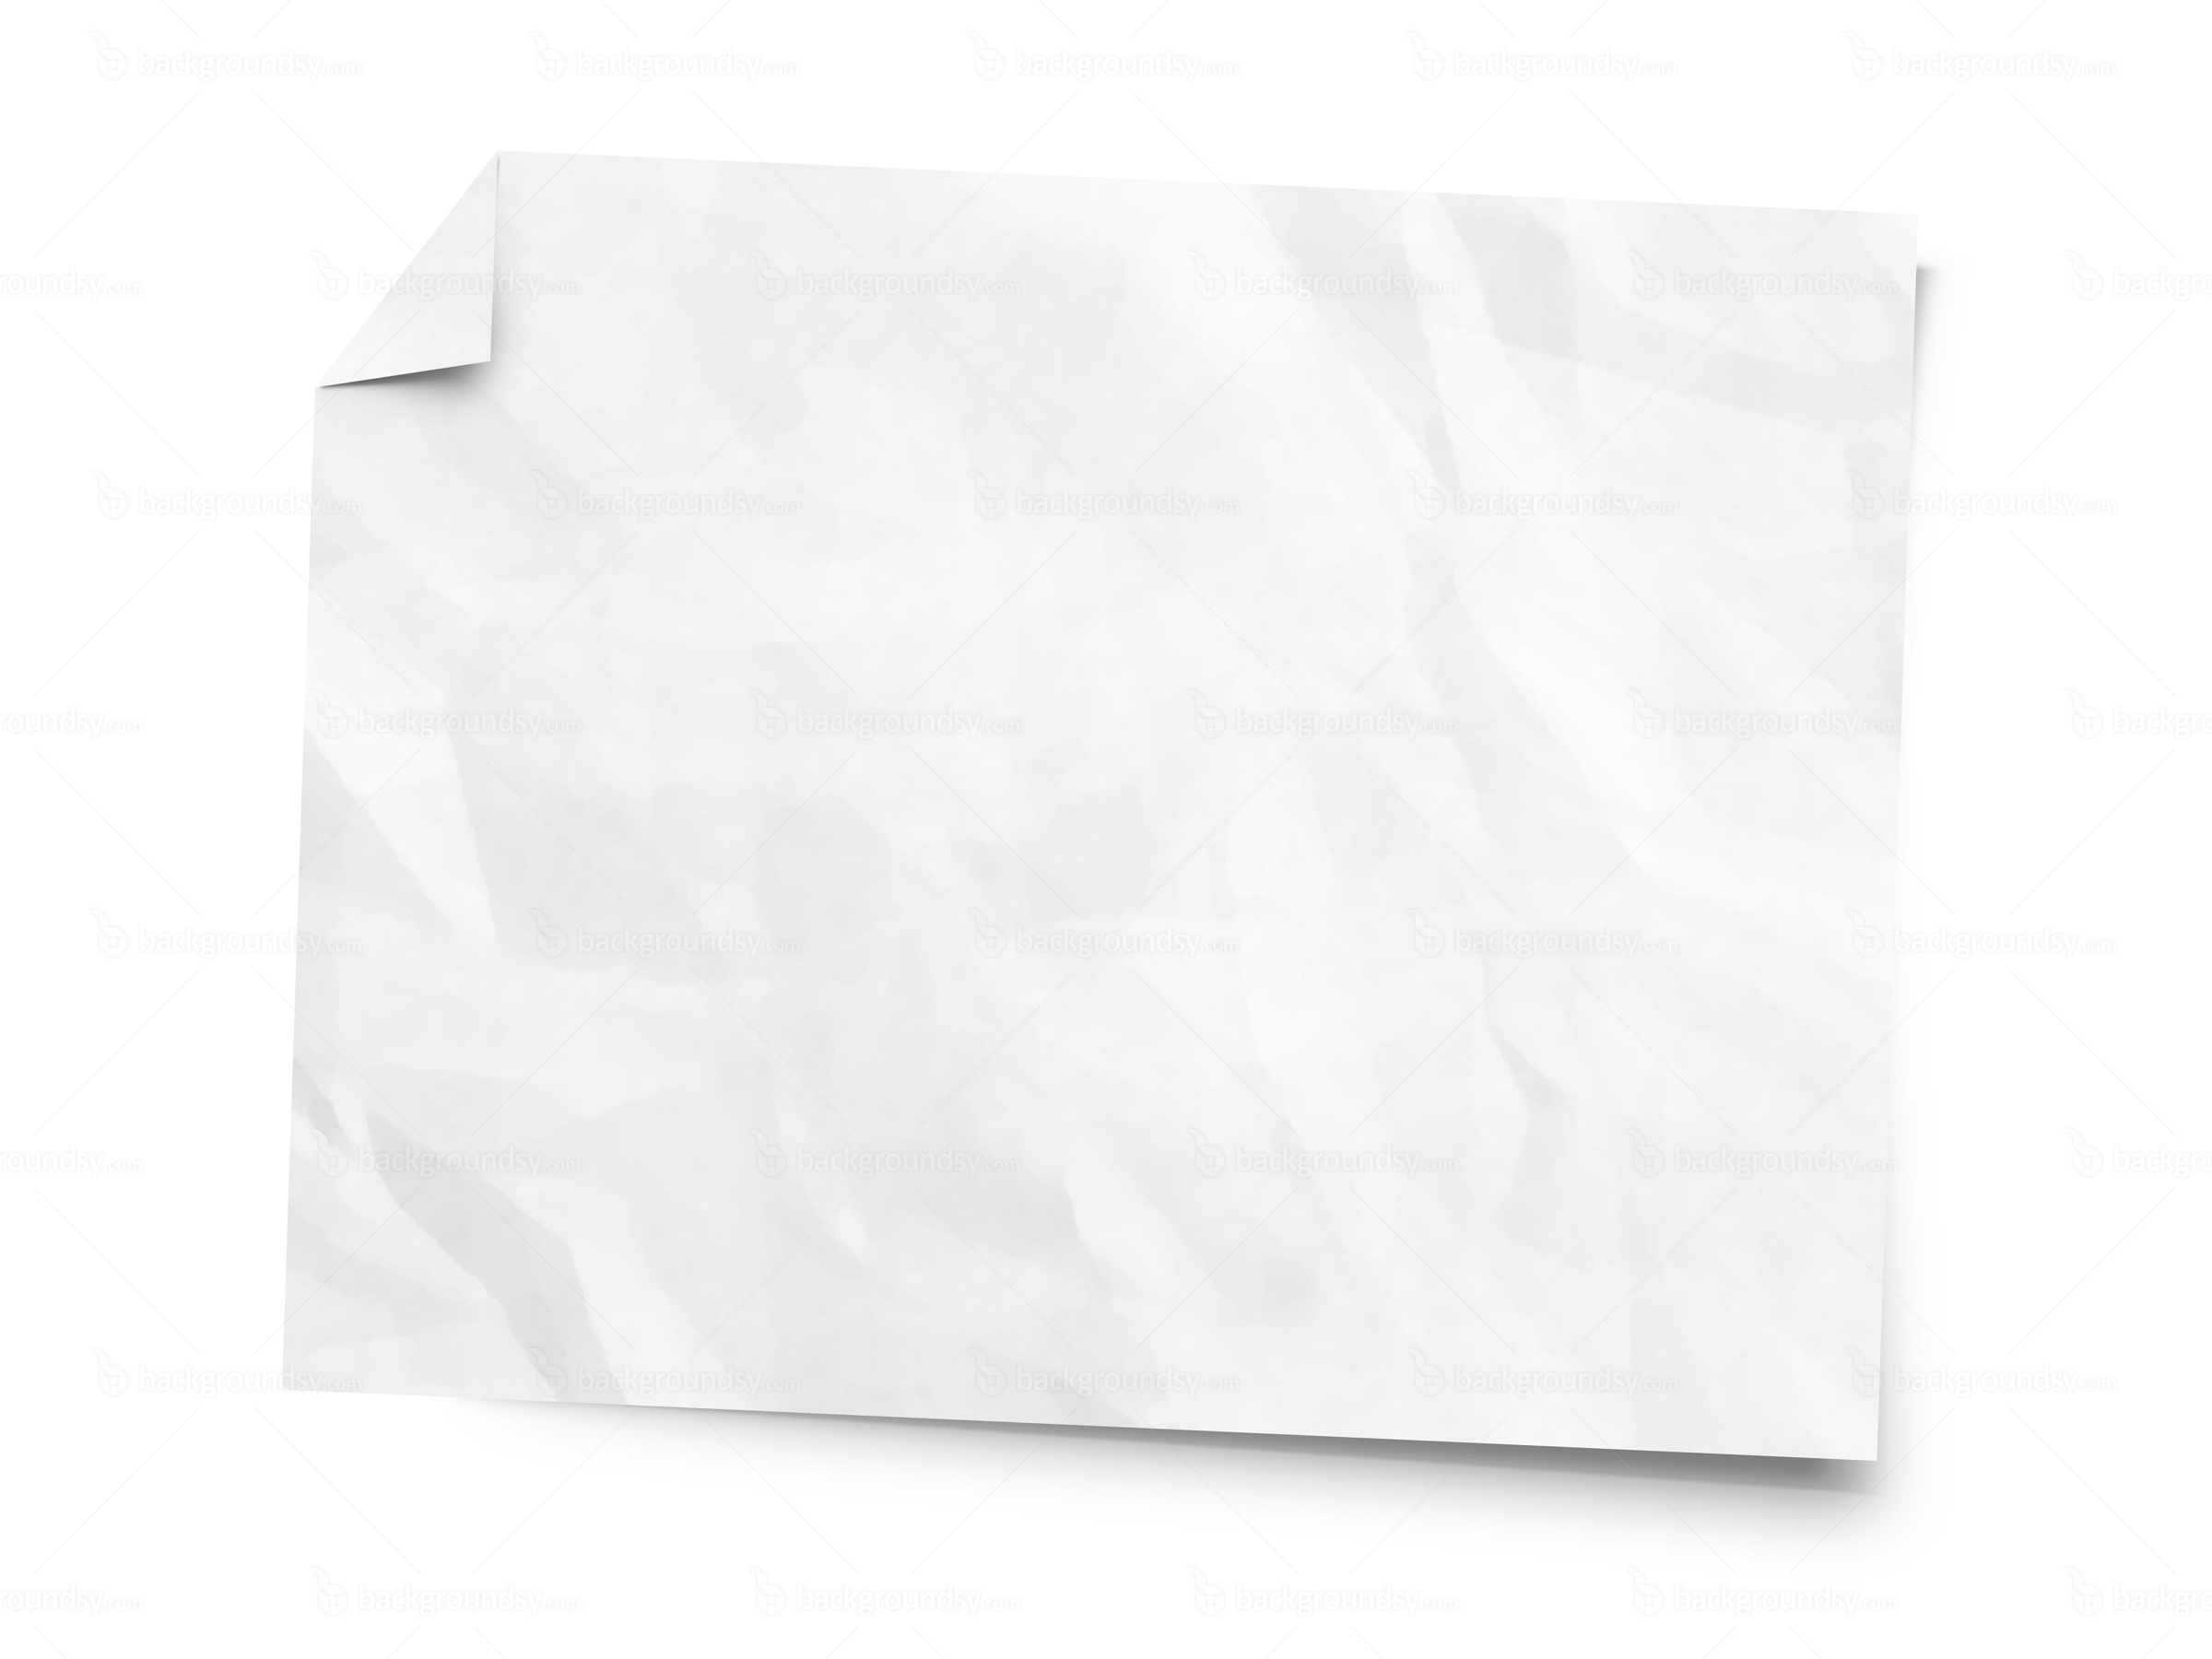 Paper Sheet PNG - 13471